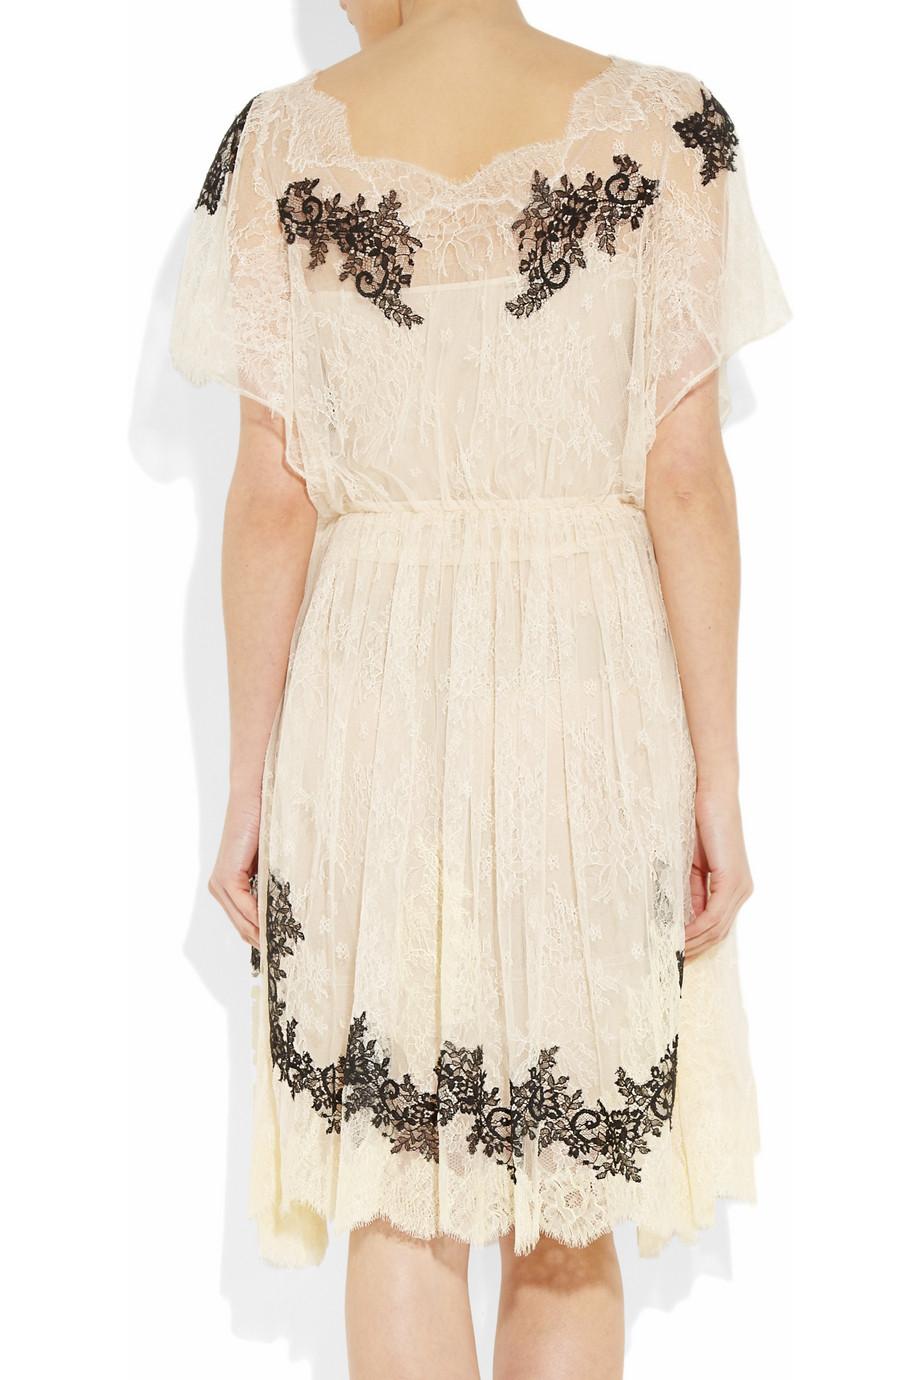 Valentino Appliqu 233 D Lace Dress In Cream Black Lyst